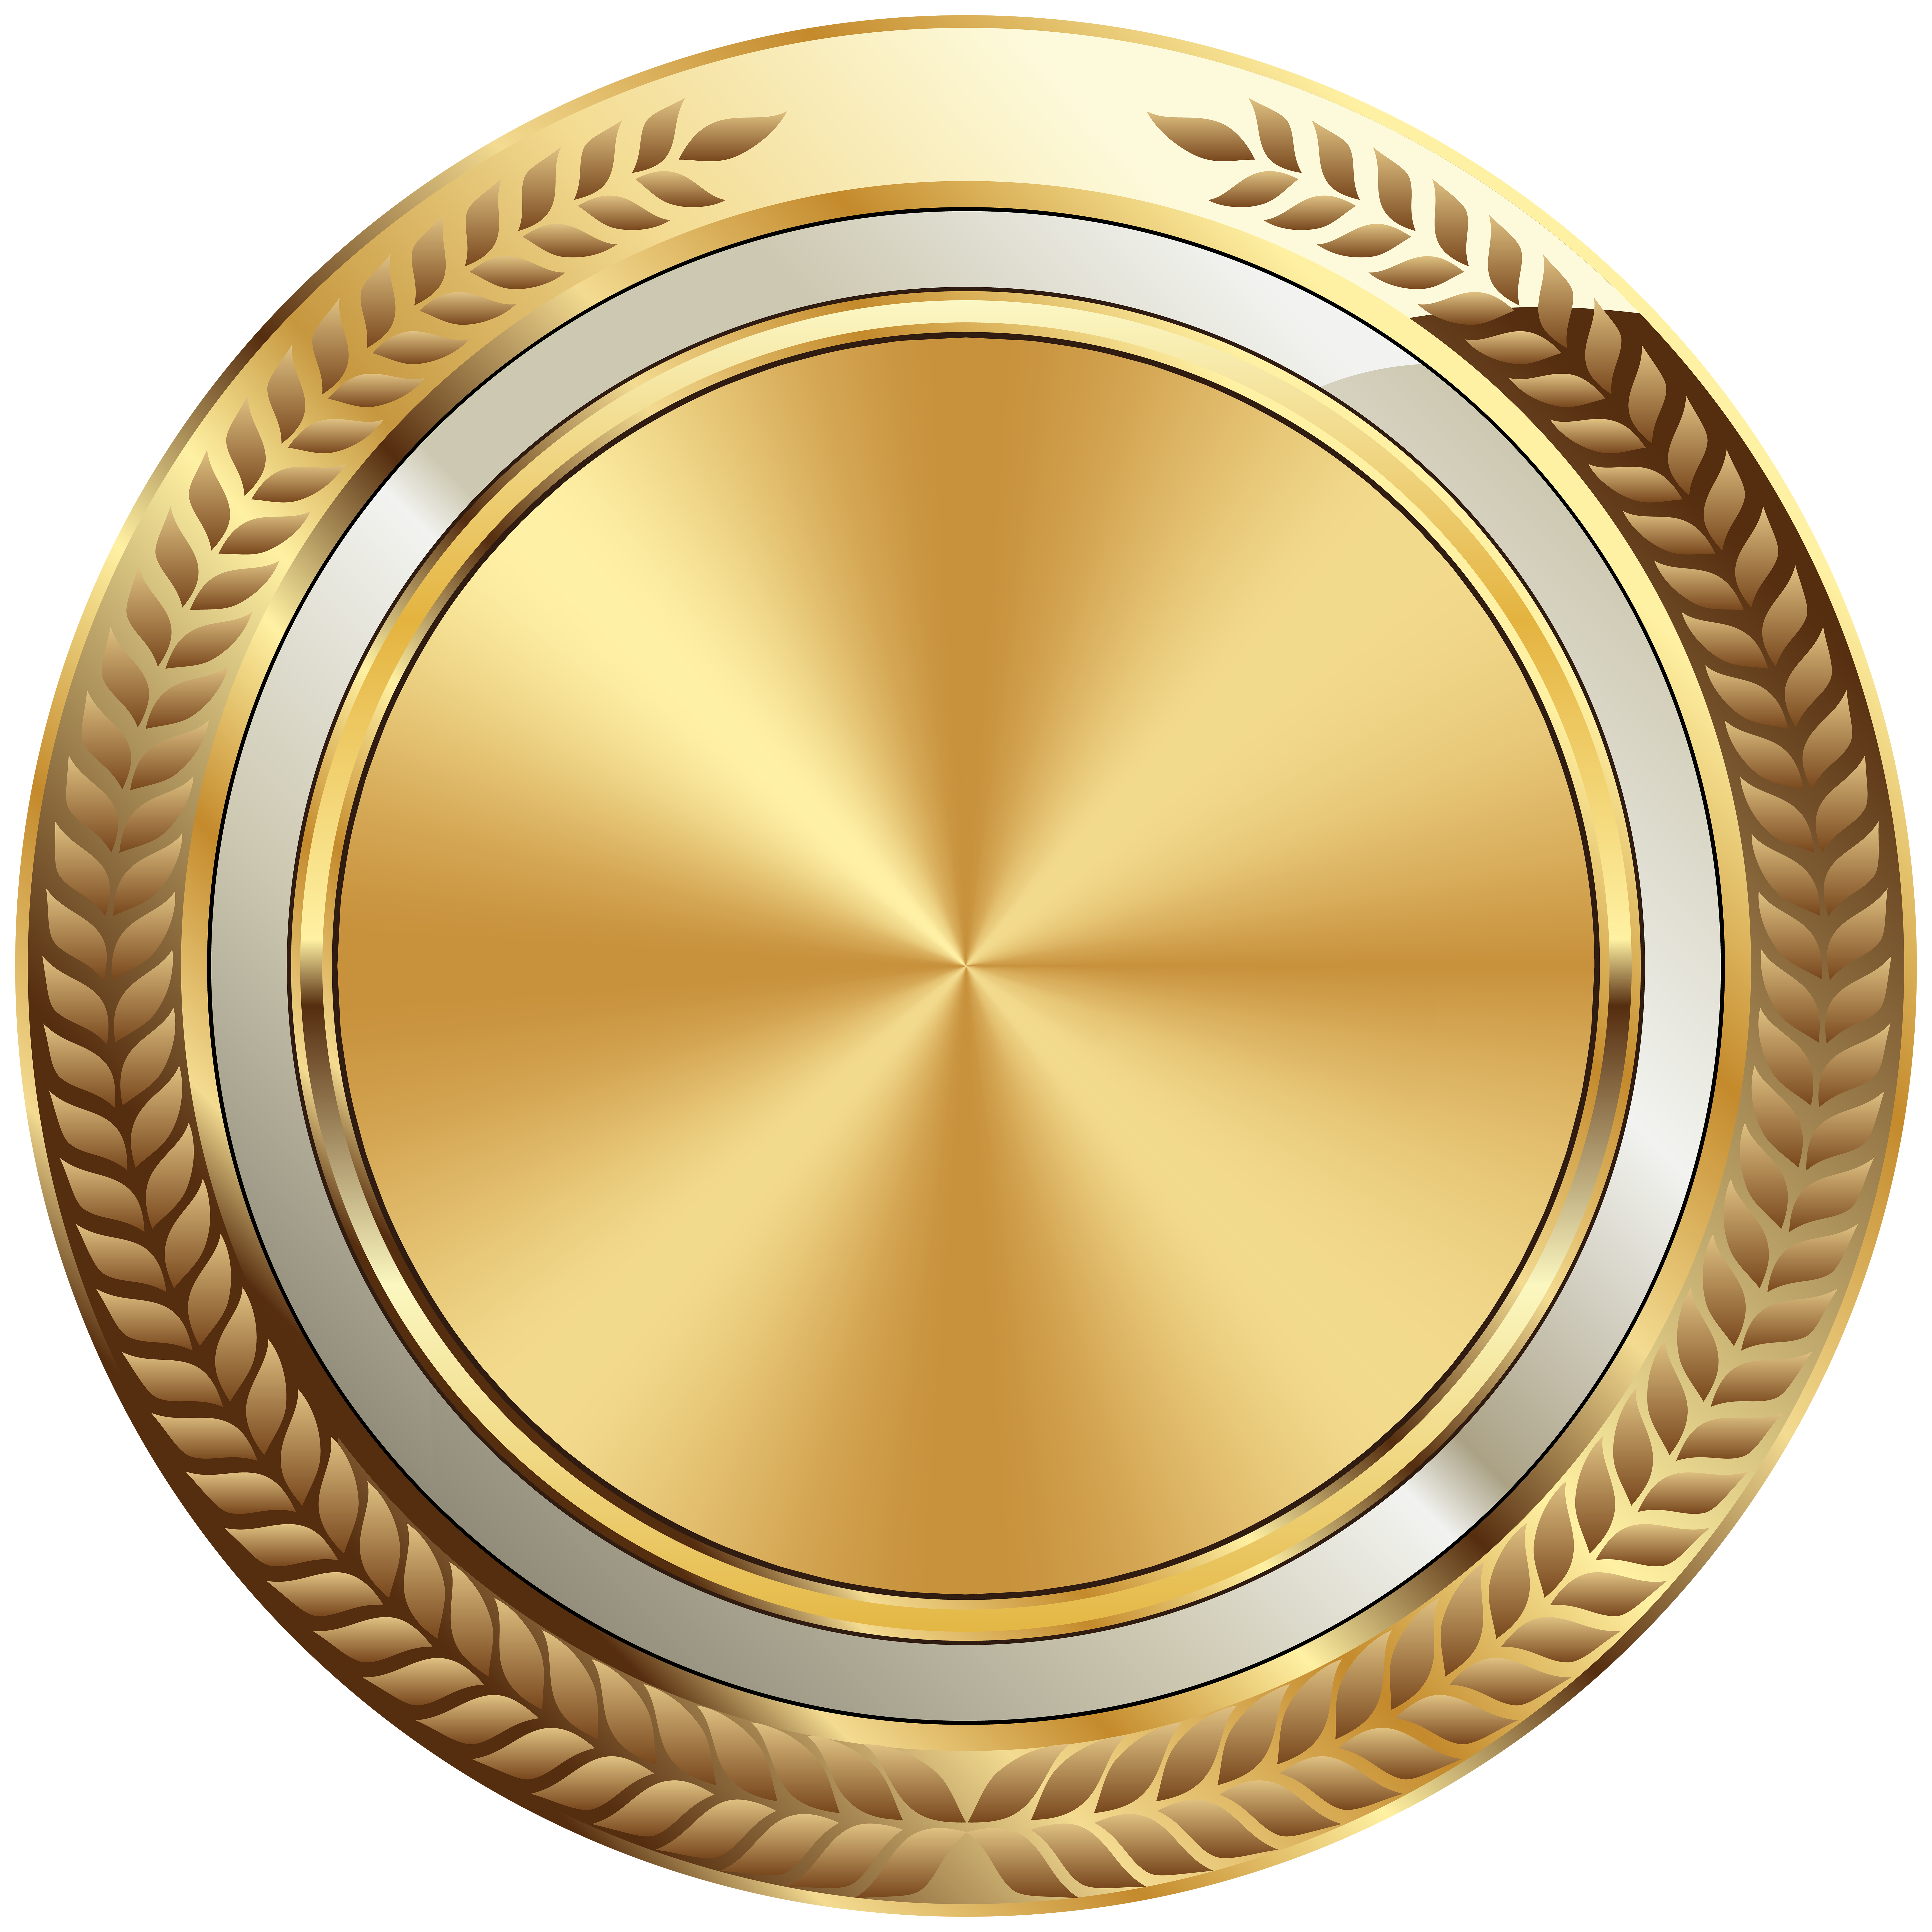 Gold Seal Badge Template Transparent Image Poster